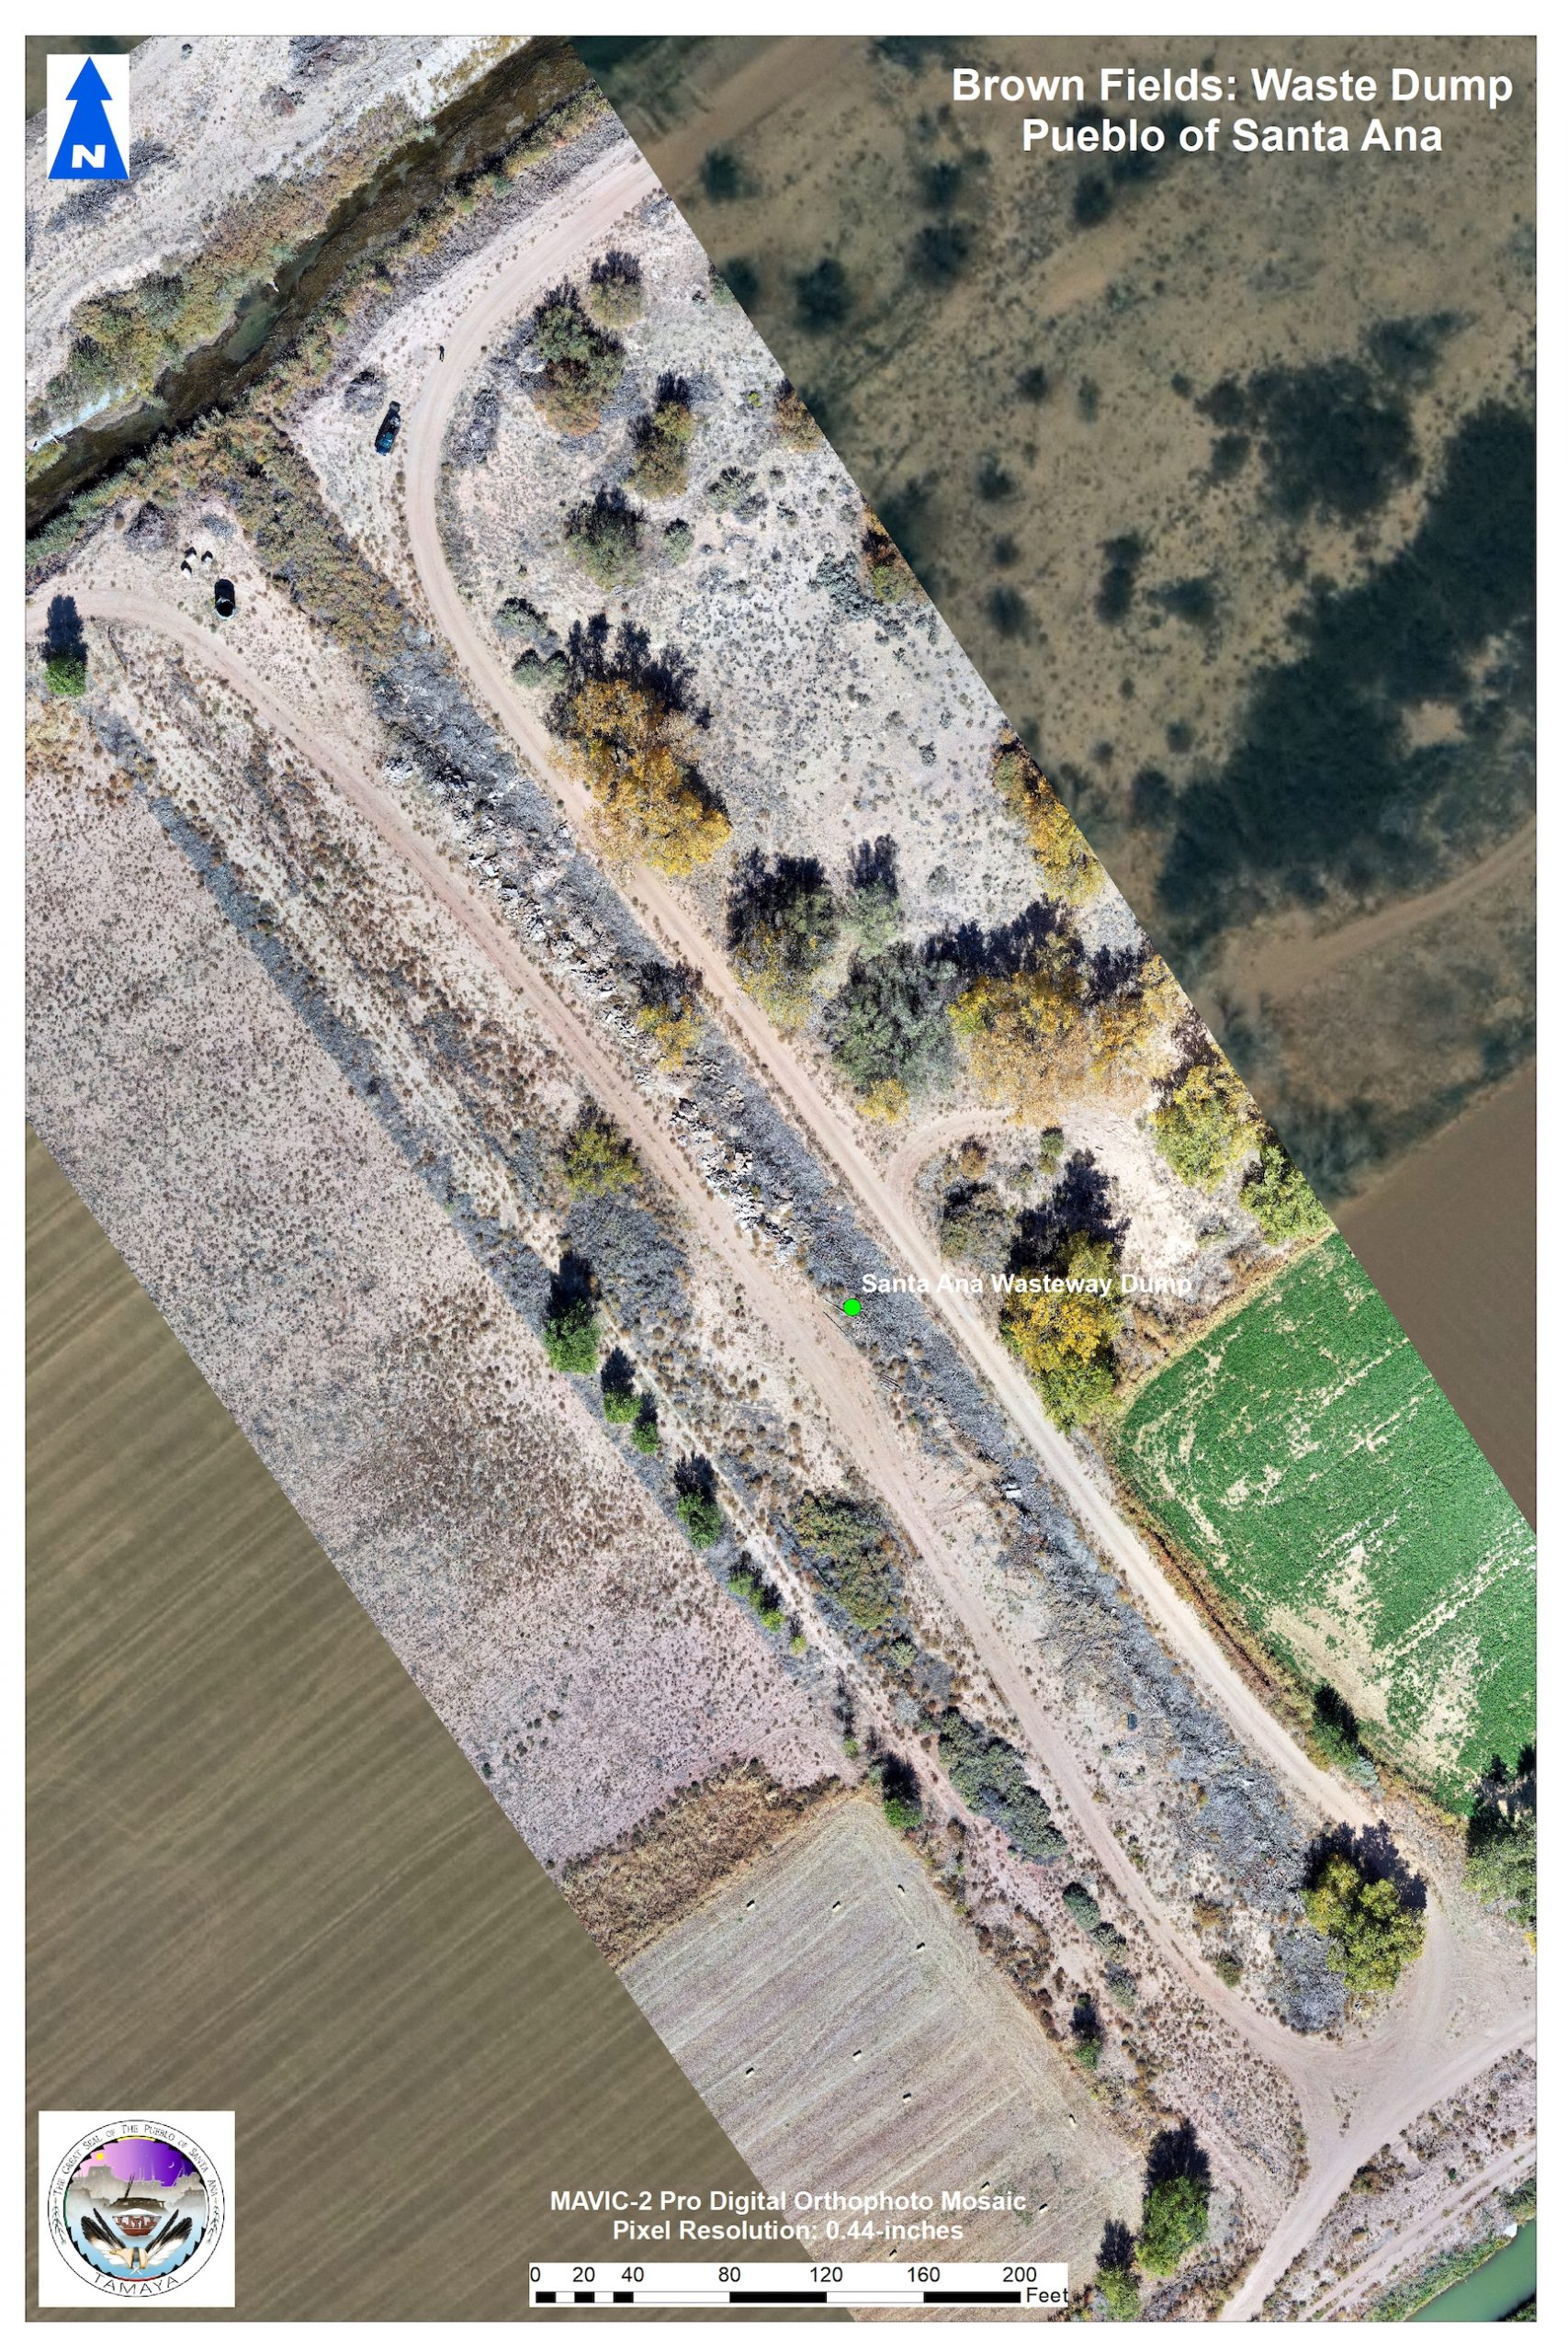 Santa Ana Wasteway Dump aerial